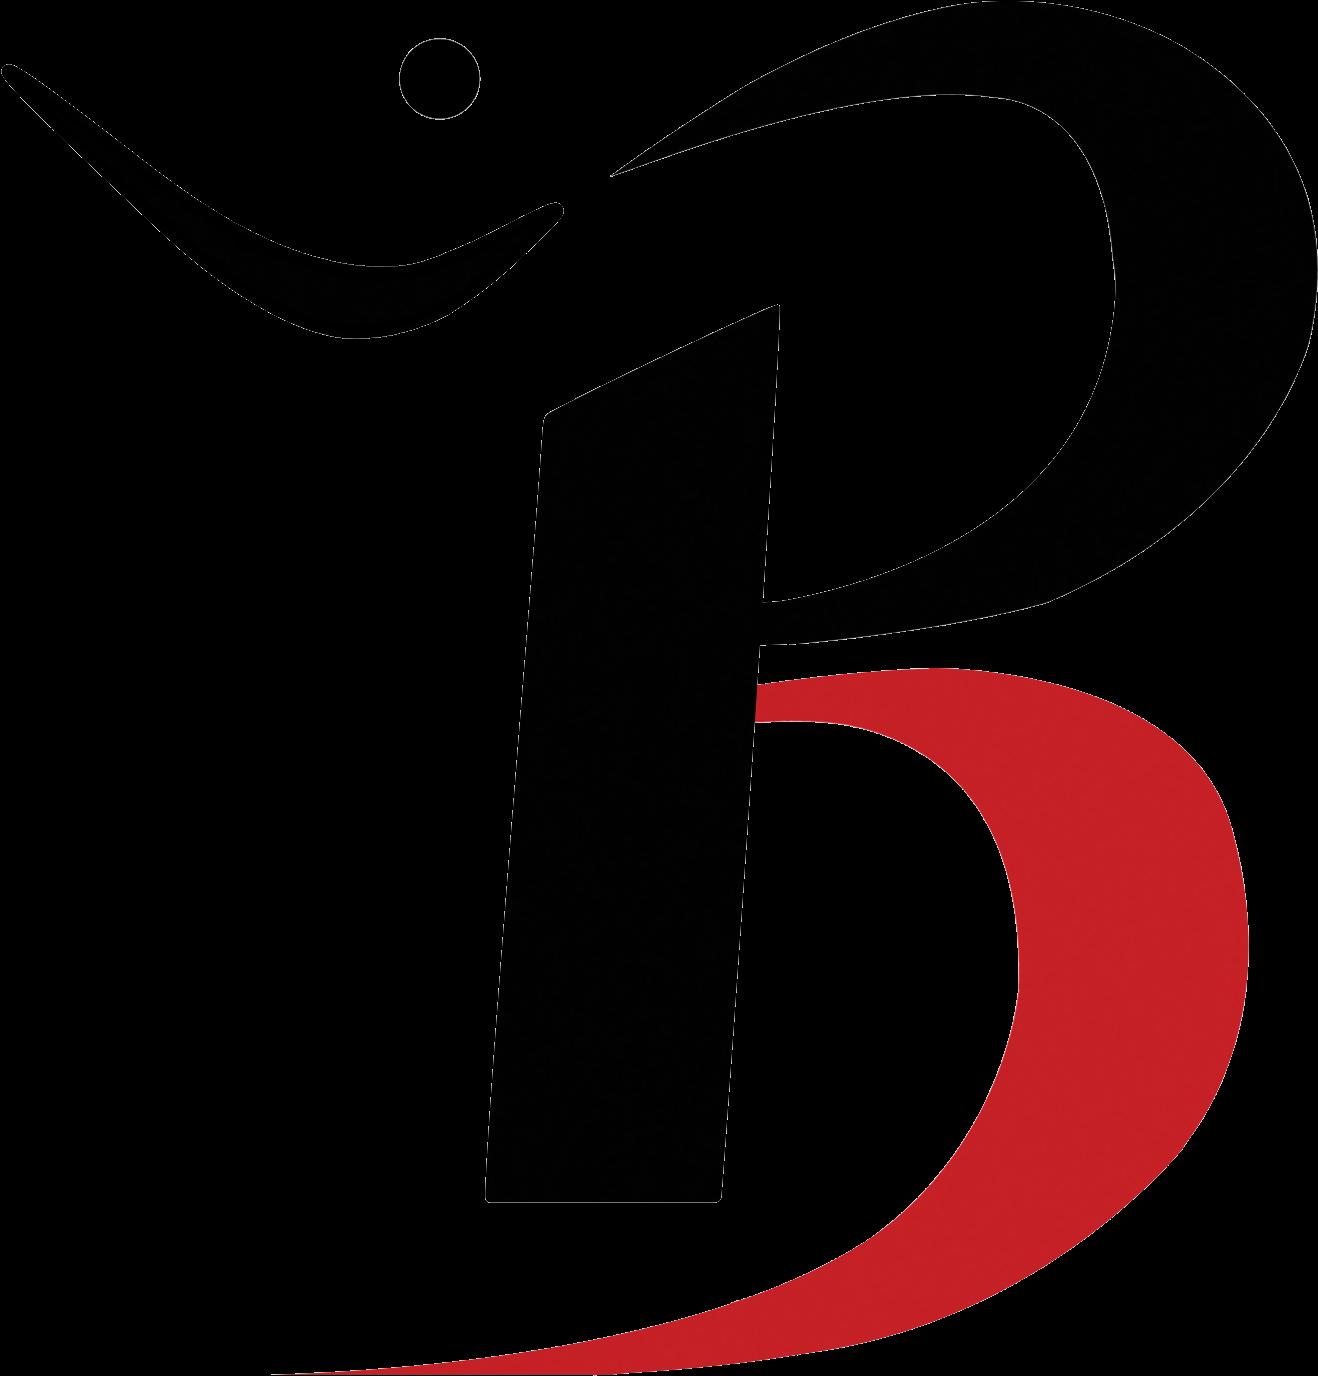 Pb logo clipart clip library Pb-logo Clipart - Full Size Clipart (#4926435) - PinClipart clip library